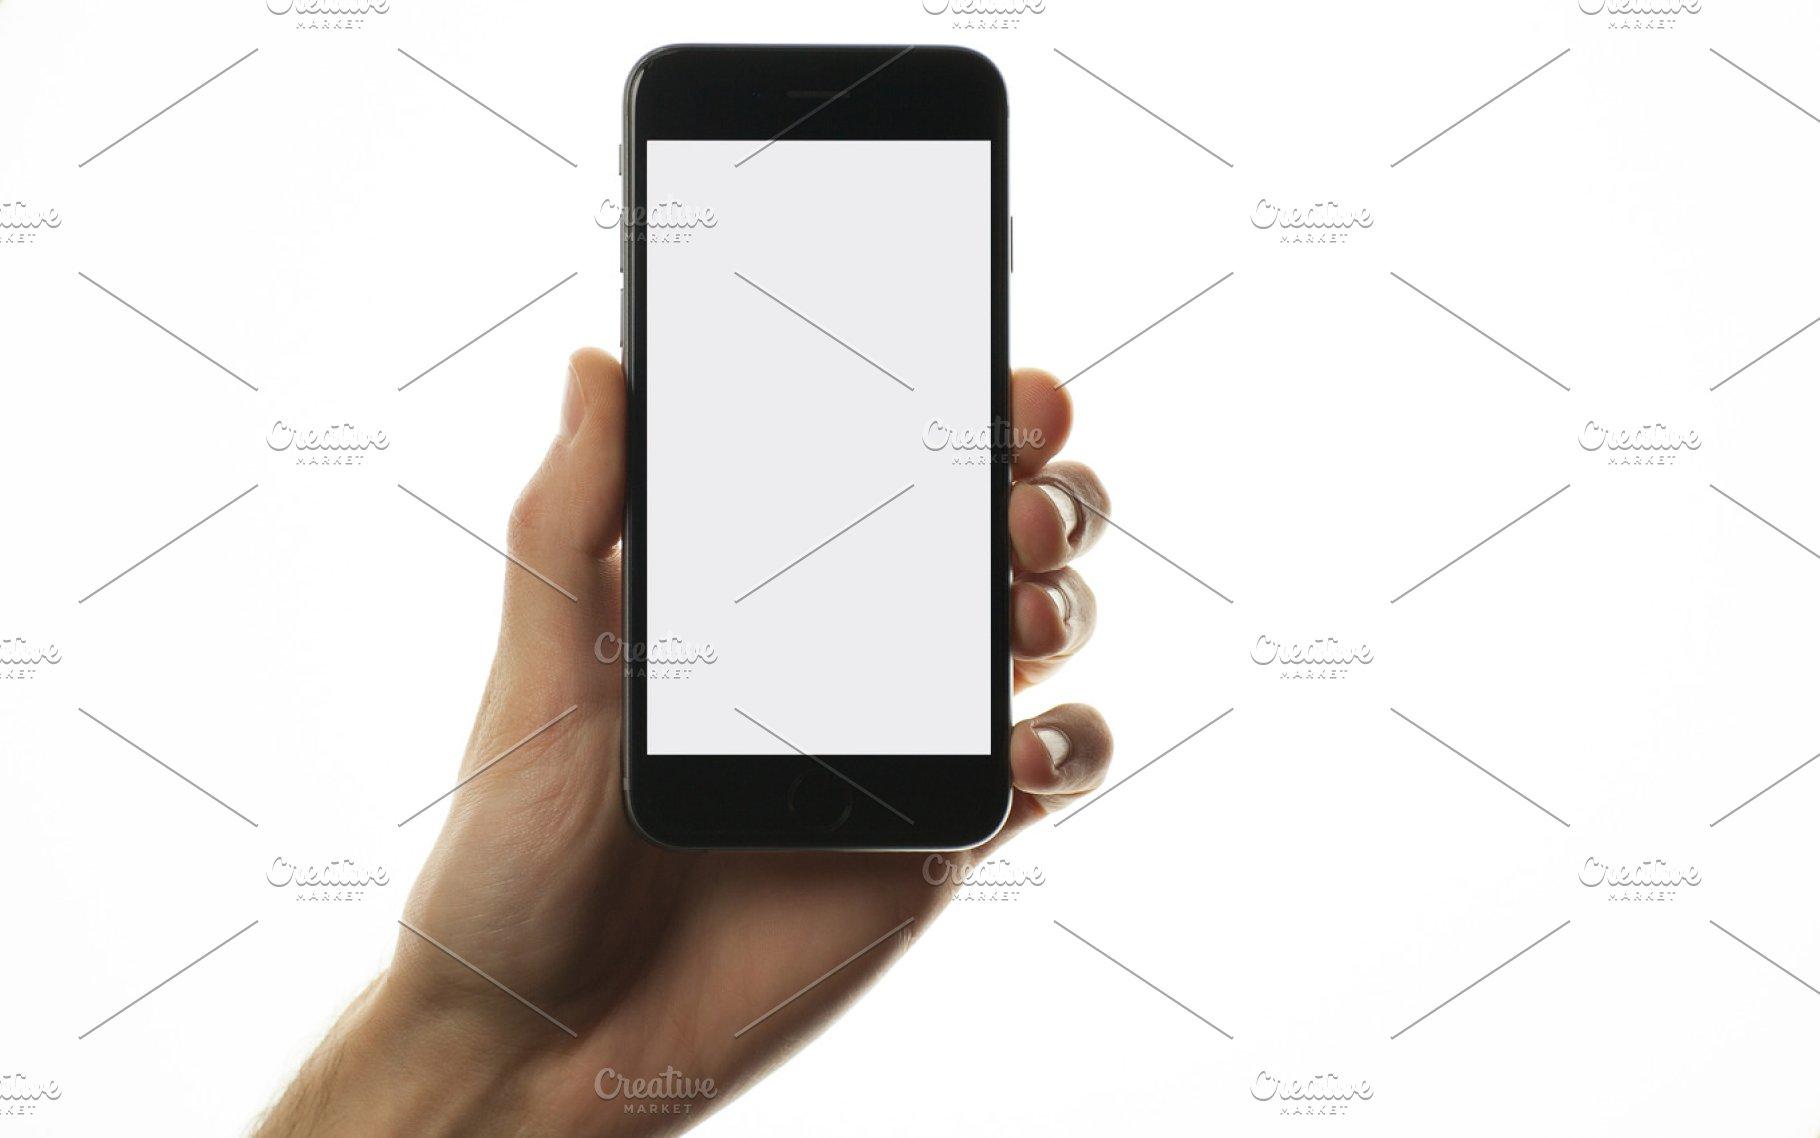 online retailer 63946 50f9c iPhone 6 with blank screen